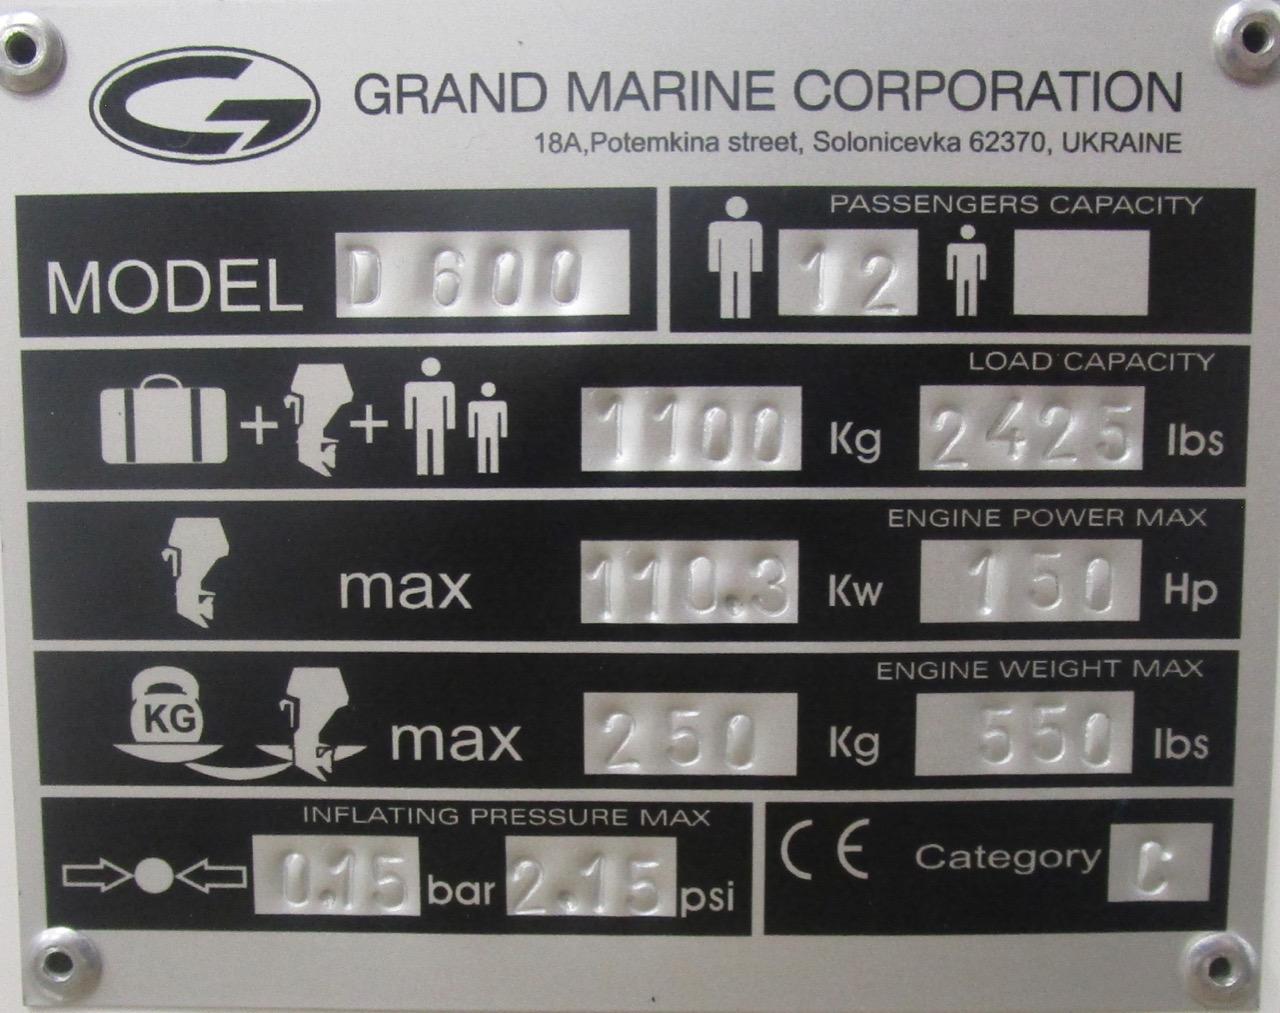 GRAND DRIVE D600 RIB CE plate